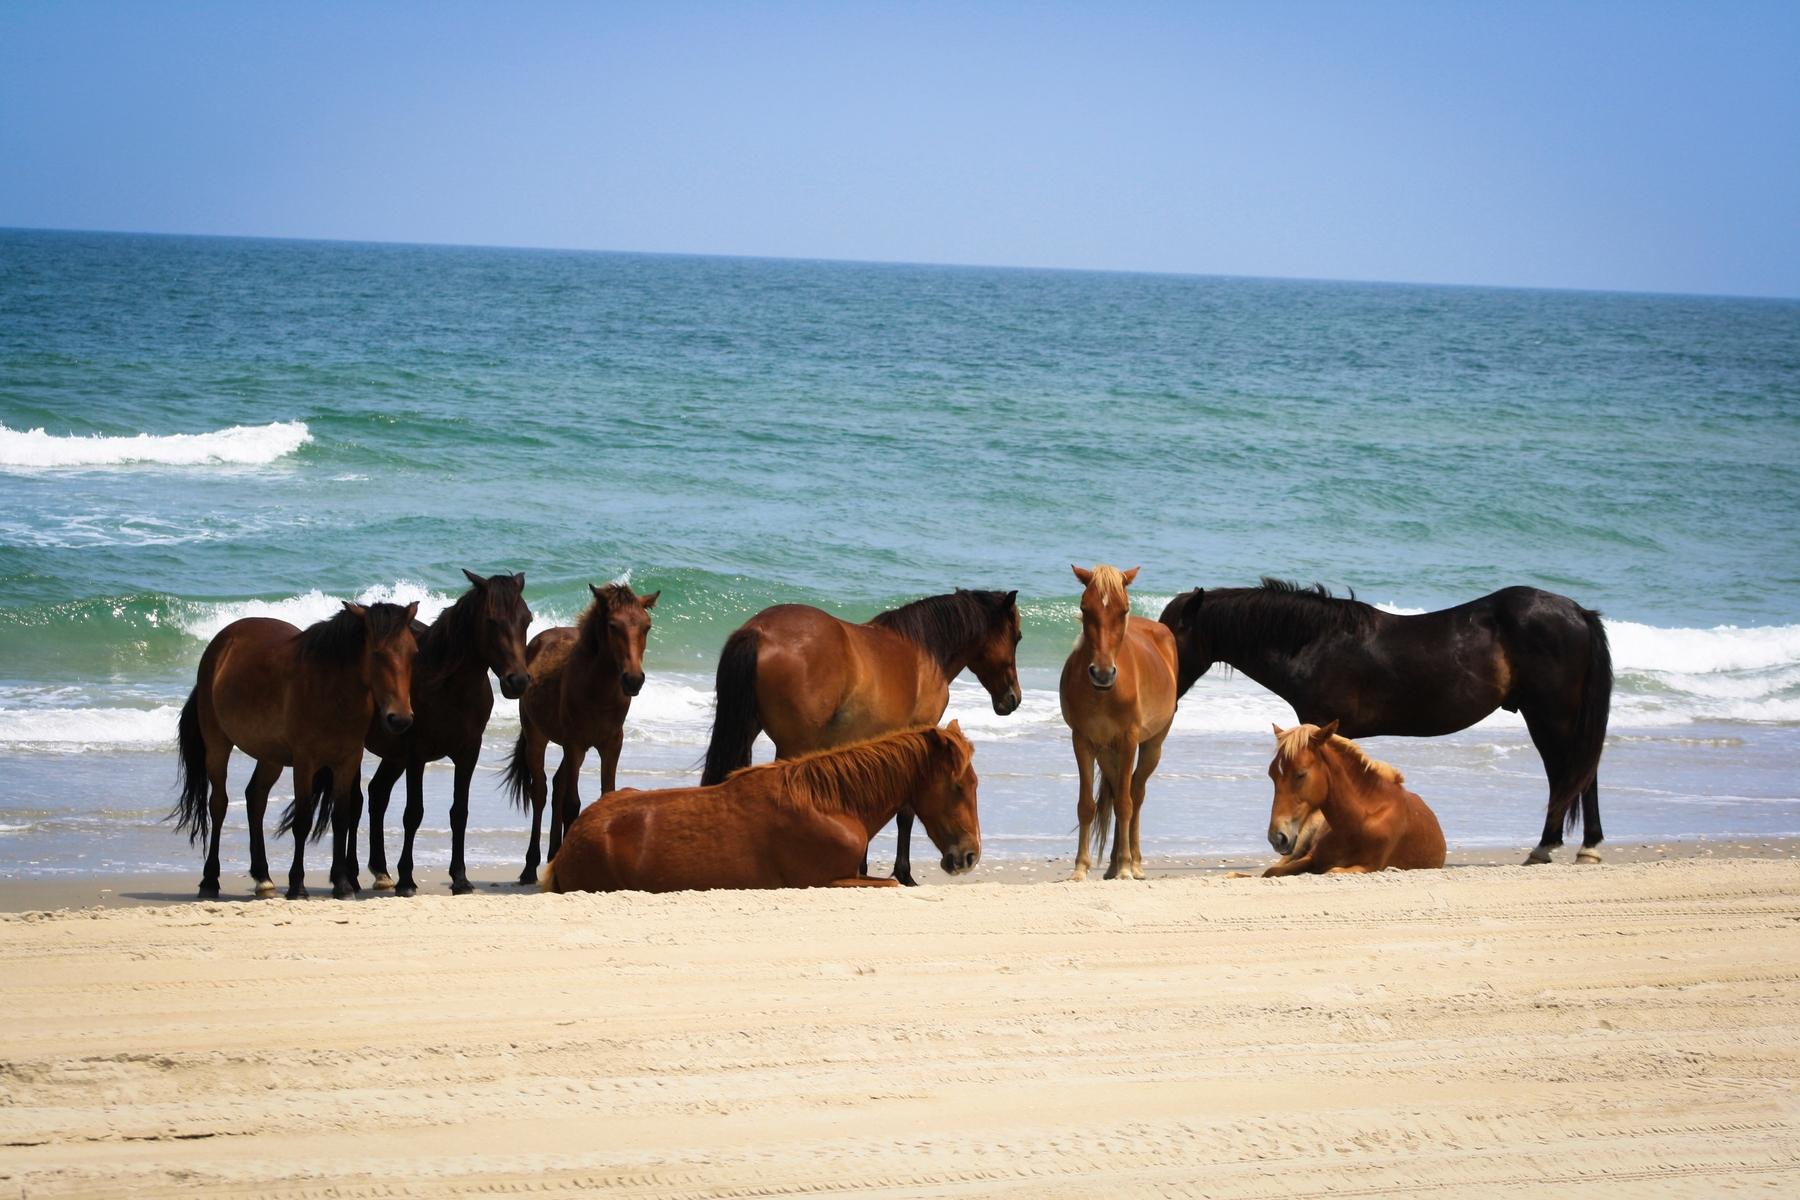 Wild horses on the beach at Outer Banks, North Carolina